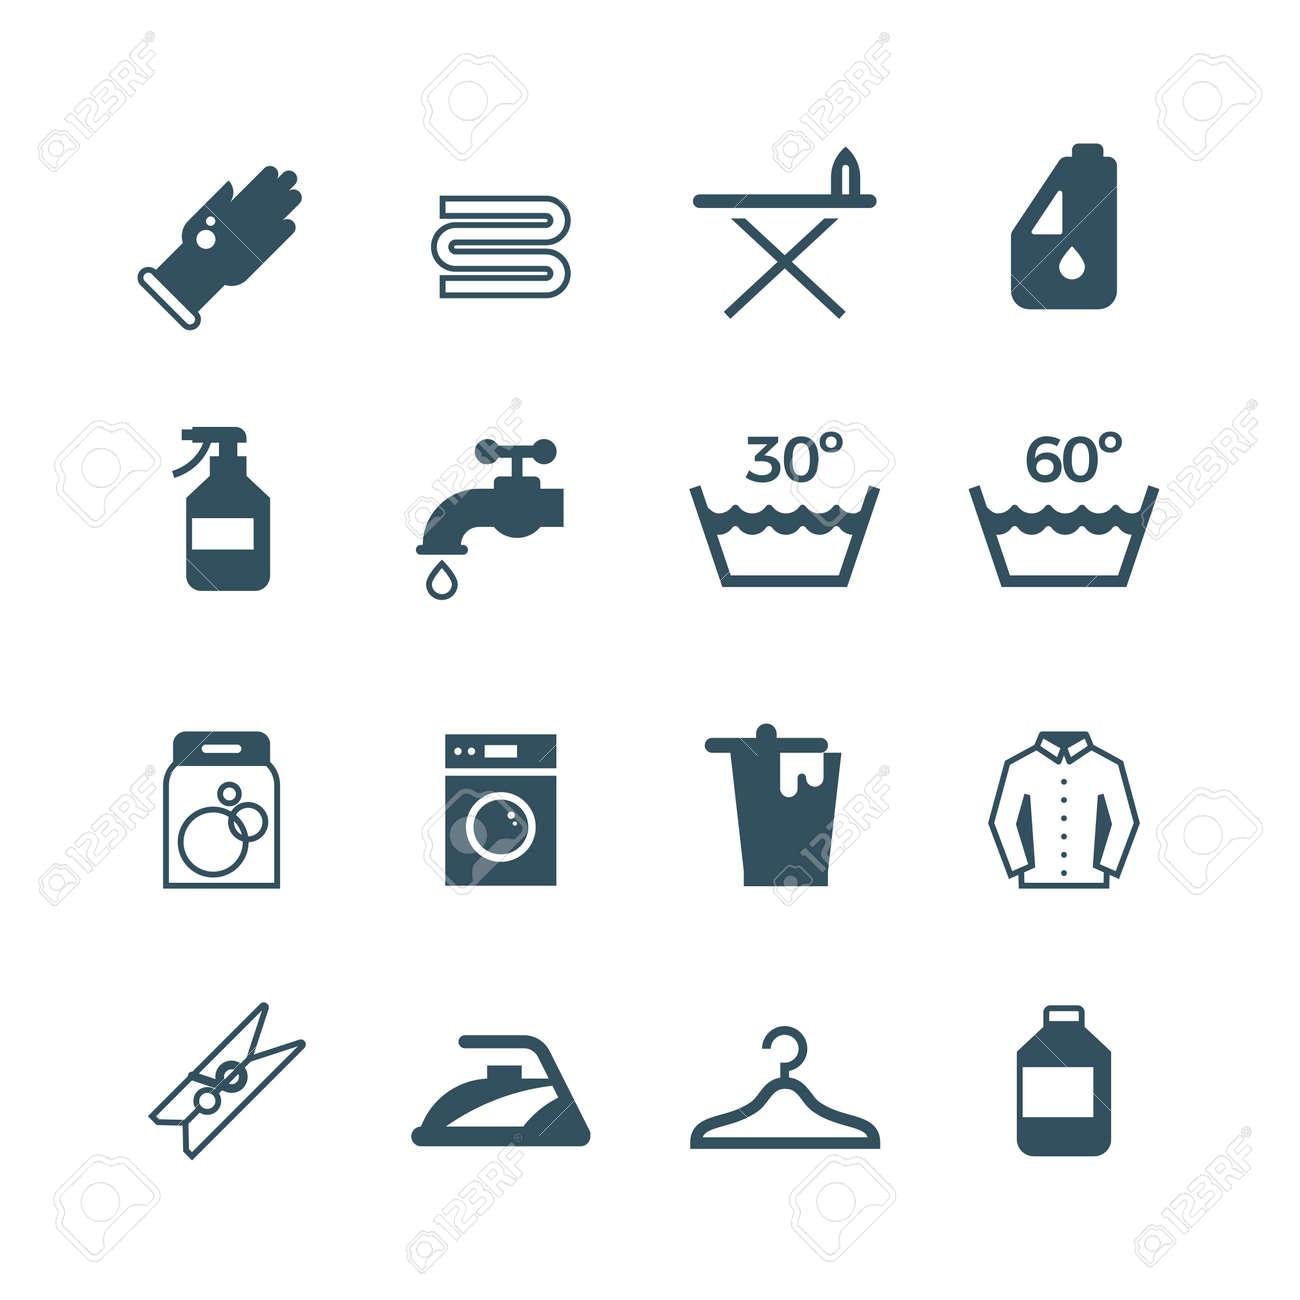 Housework and laundry vector icon. Laundry machine and washing, illustration of equipment washing - 165950345